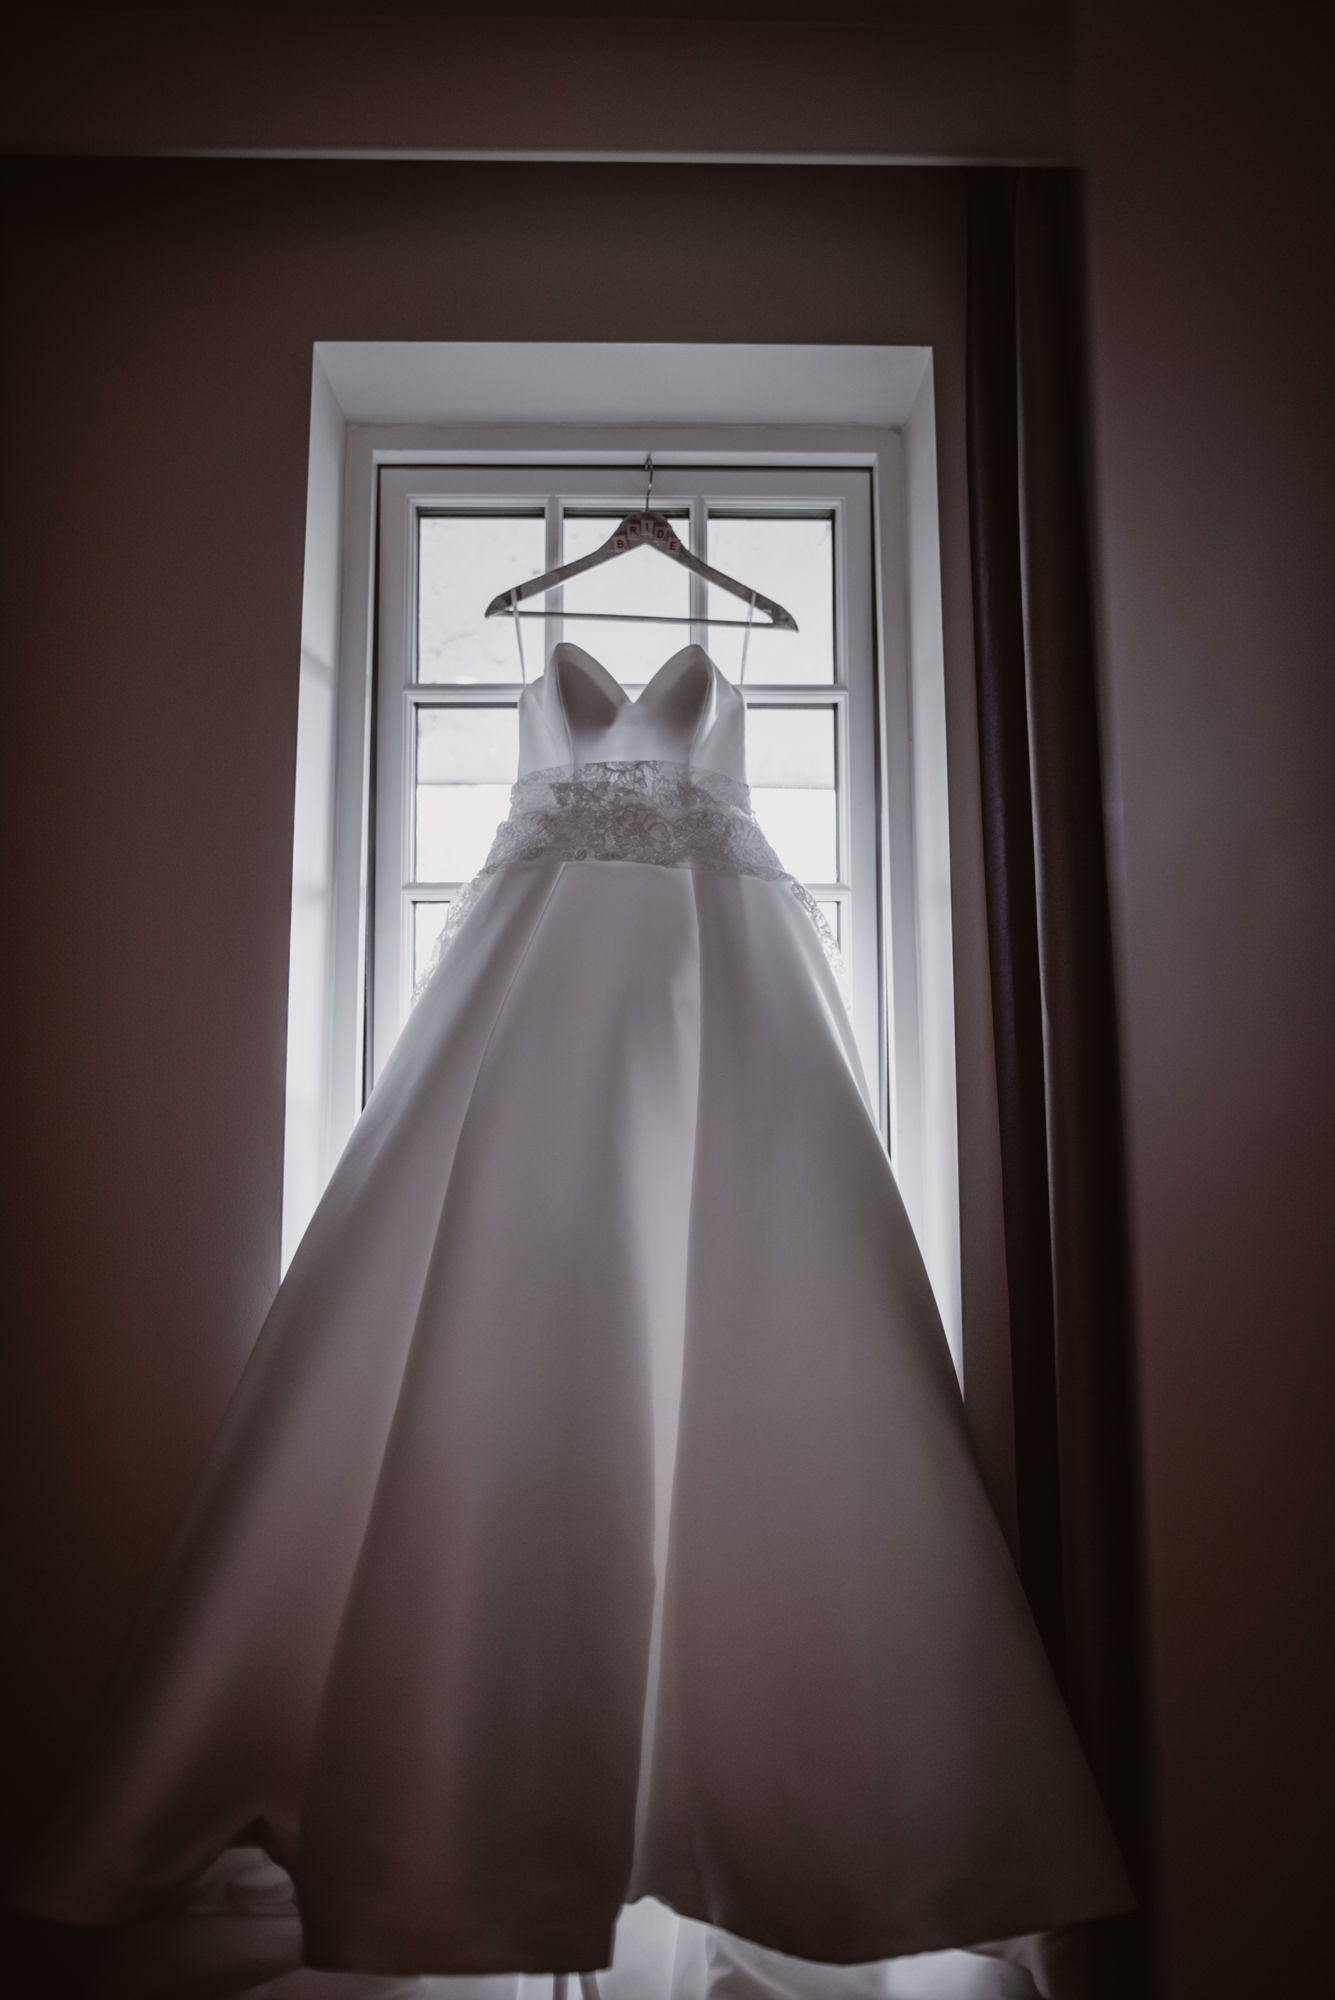 Jacqueline-Gareth-Wedding-Westmead-Events-Surrey-Manu-Mendoza-Wedding-Photography-107.jpg